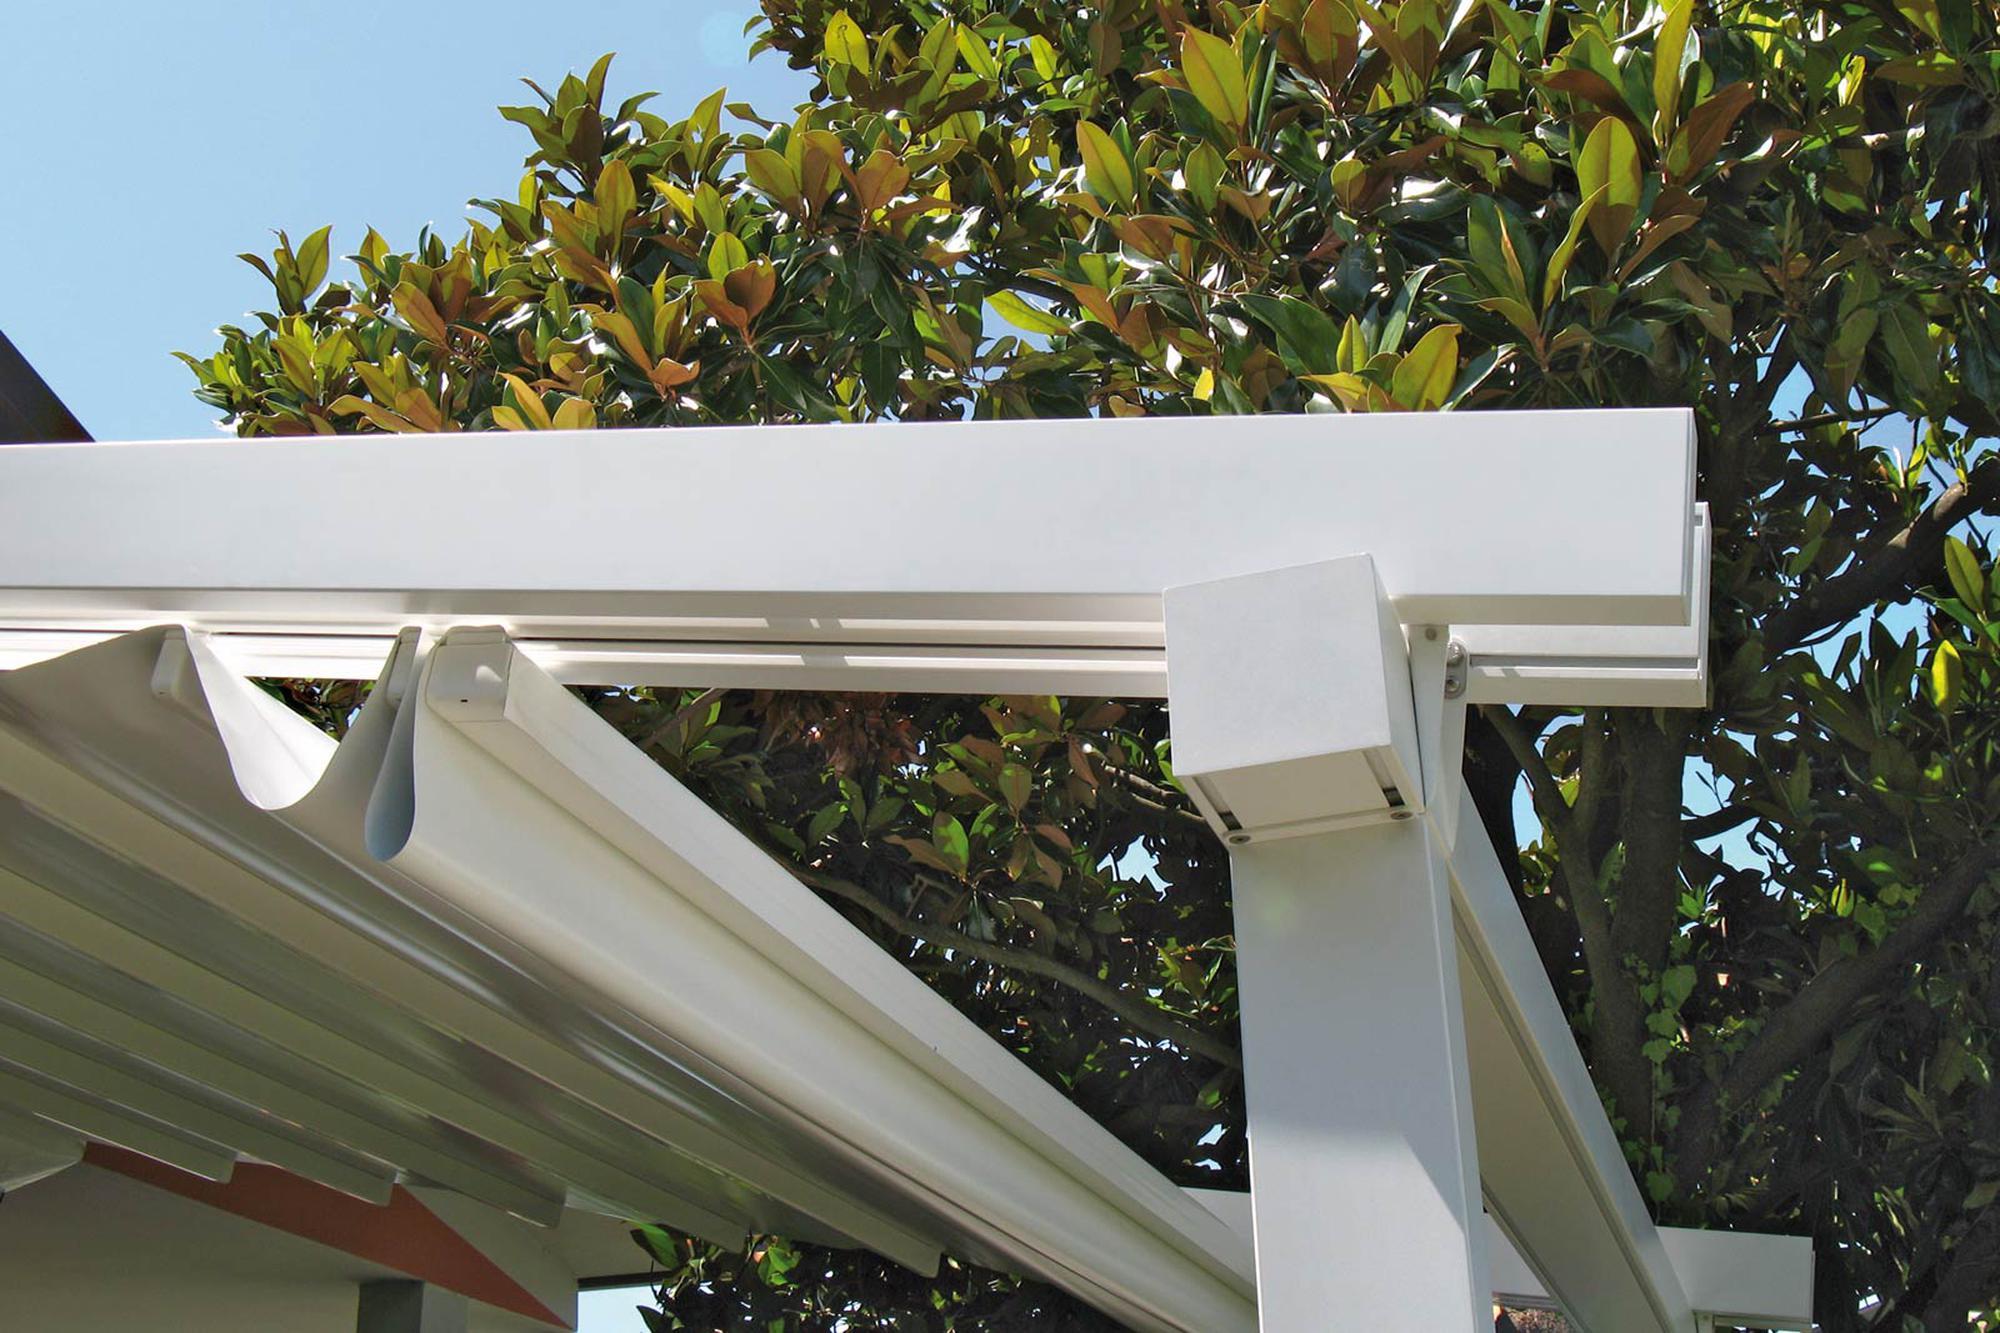 ferrara retractable residential commercial patio deck attached pergola cover system